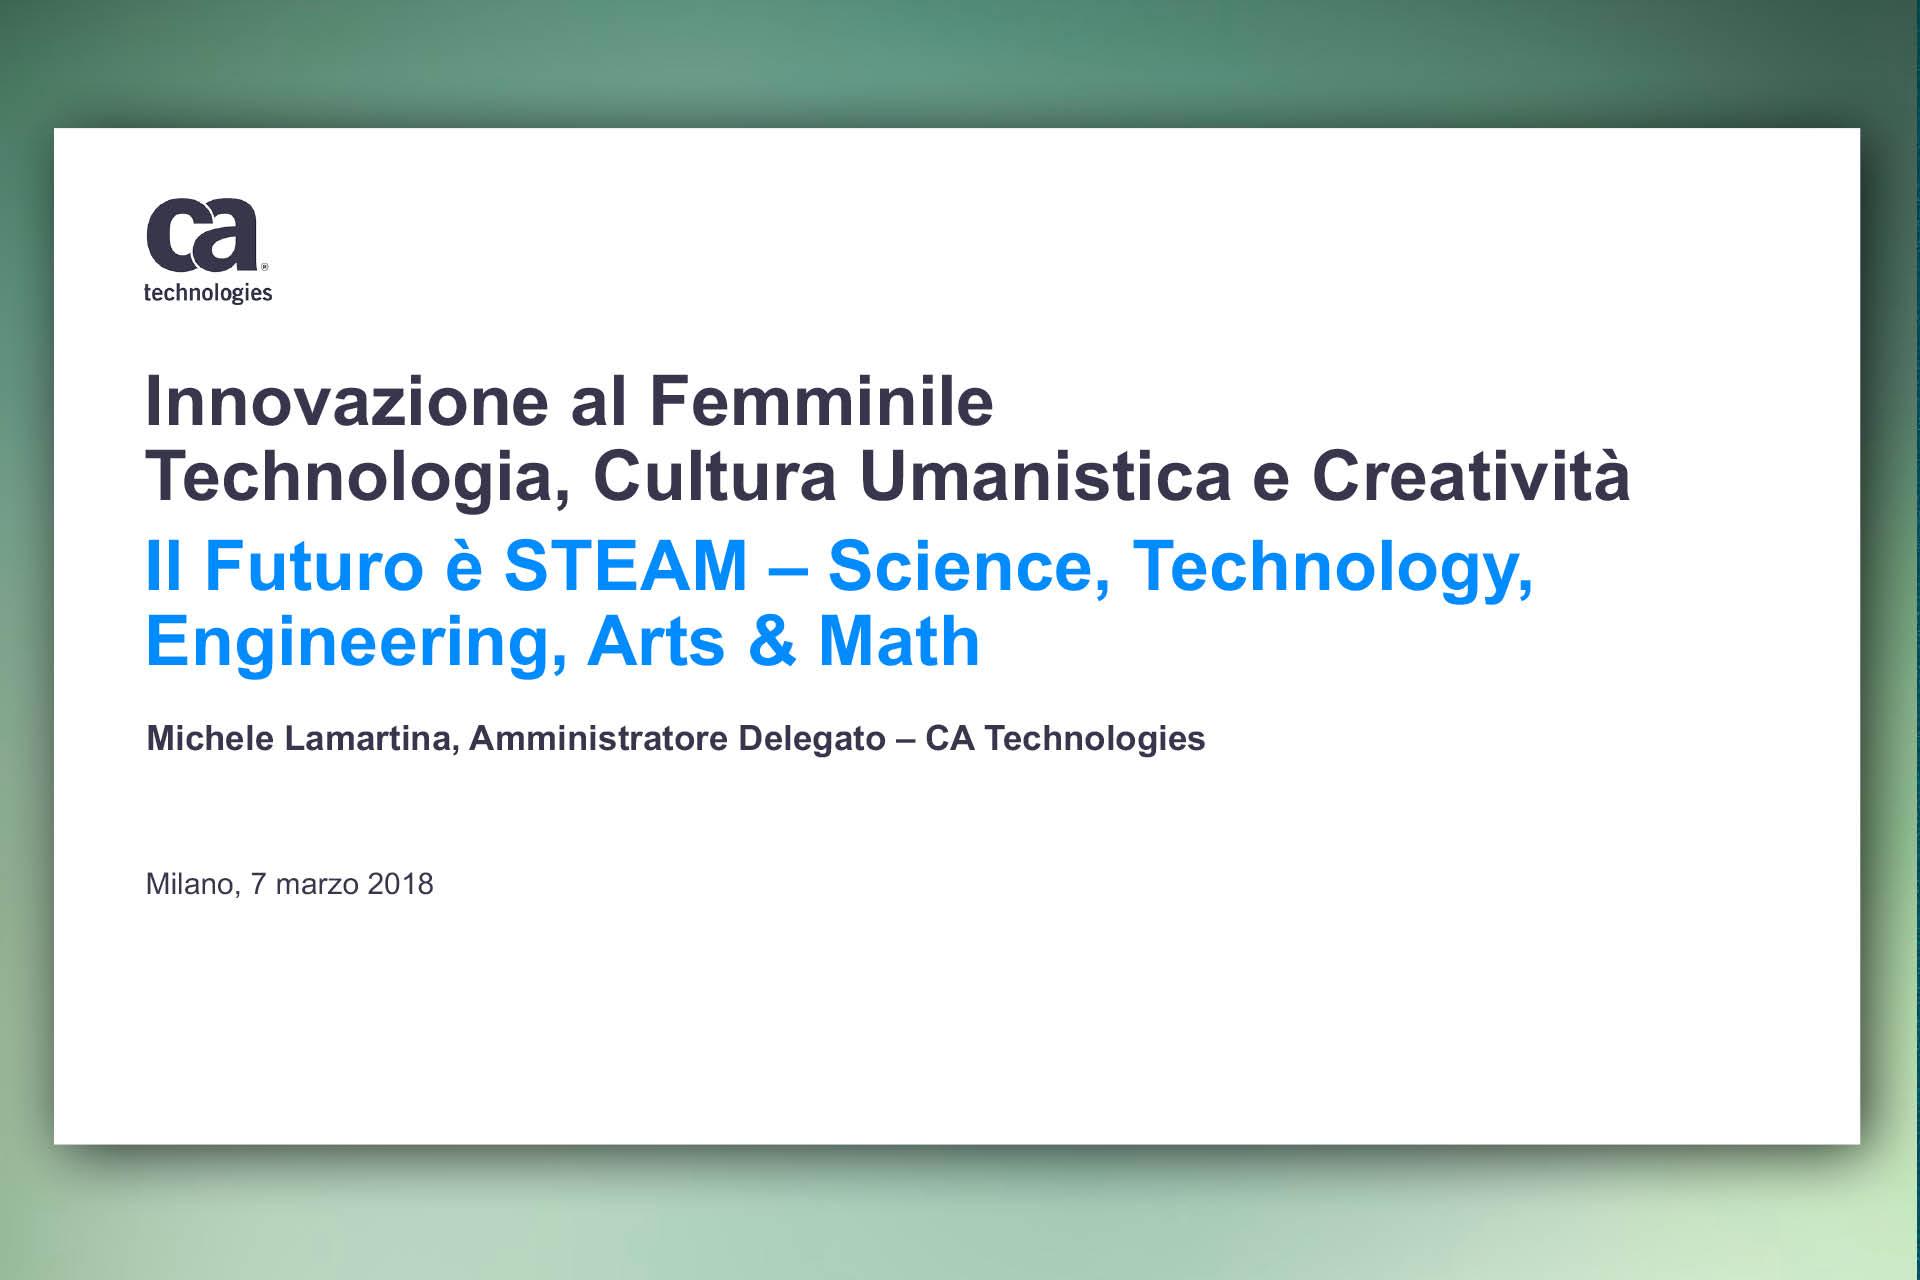 Presentazione PowerPoint Computer Associate Technologies